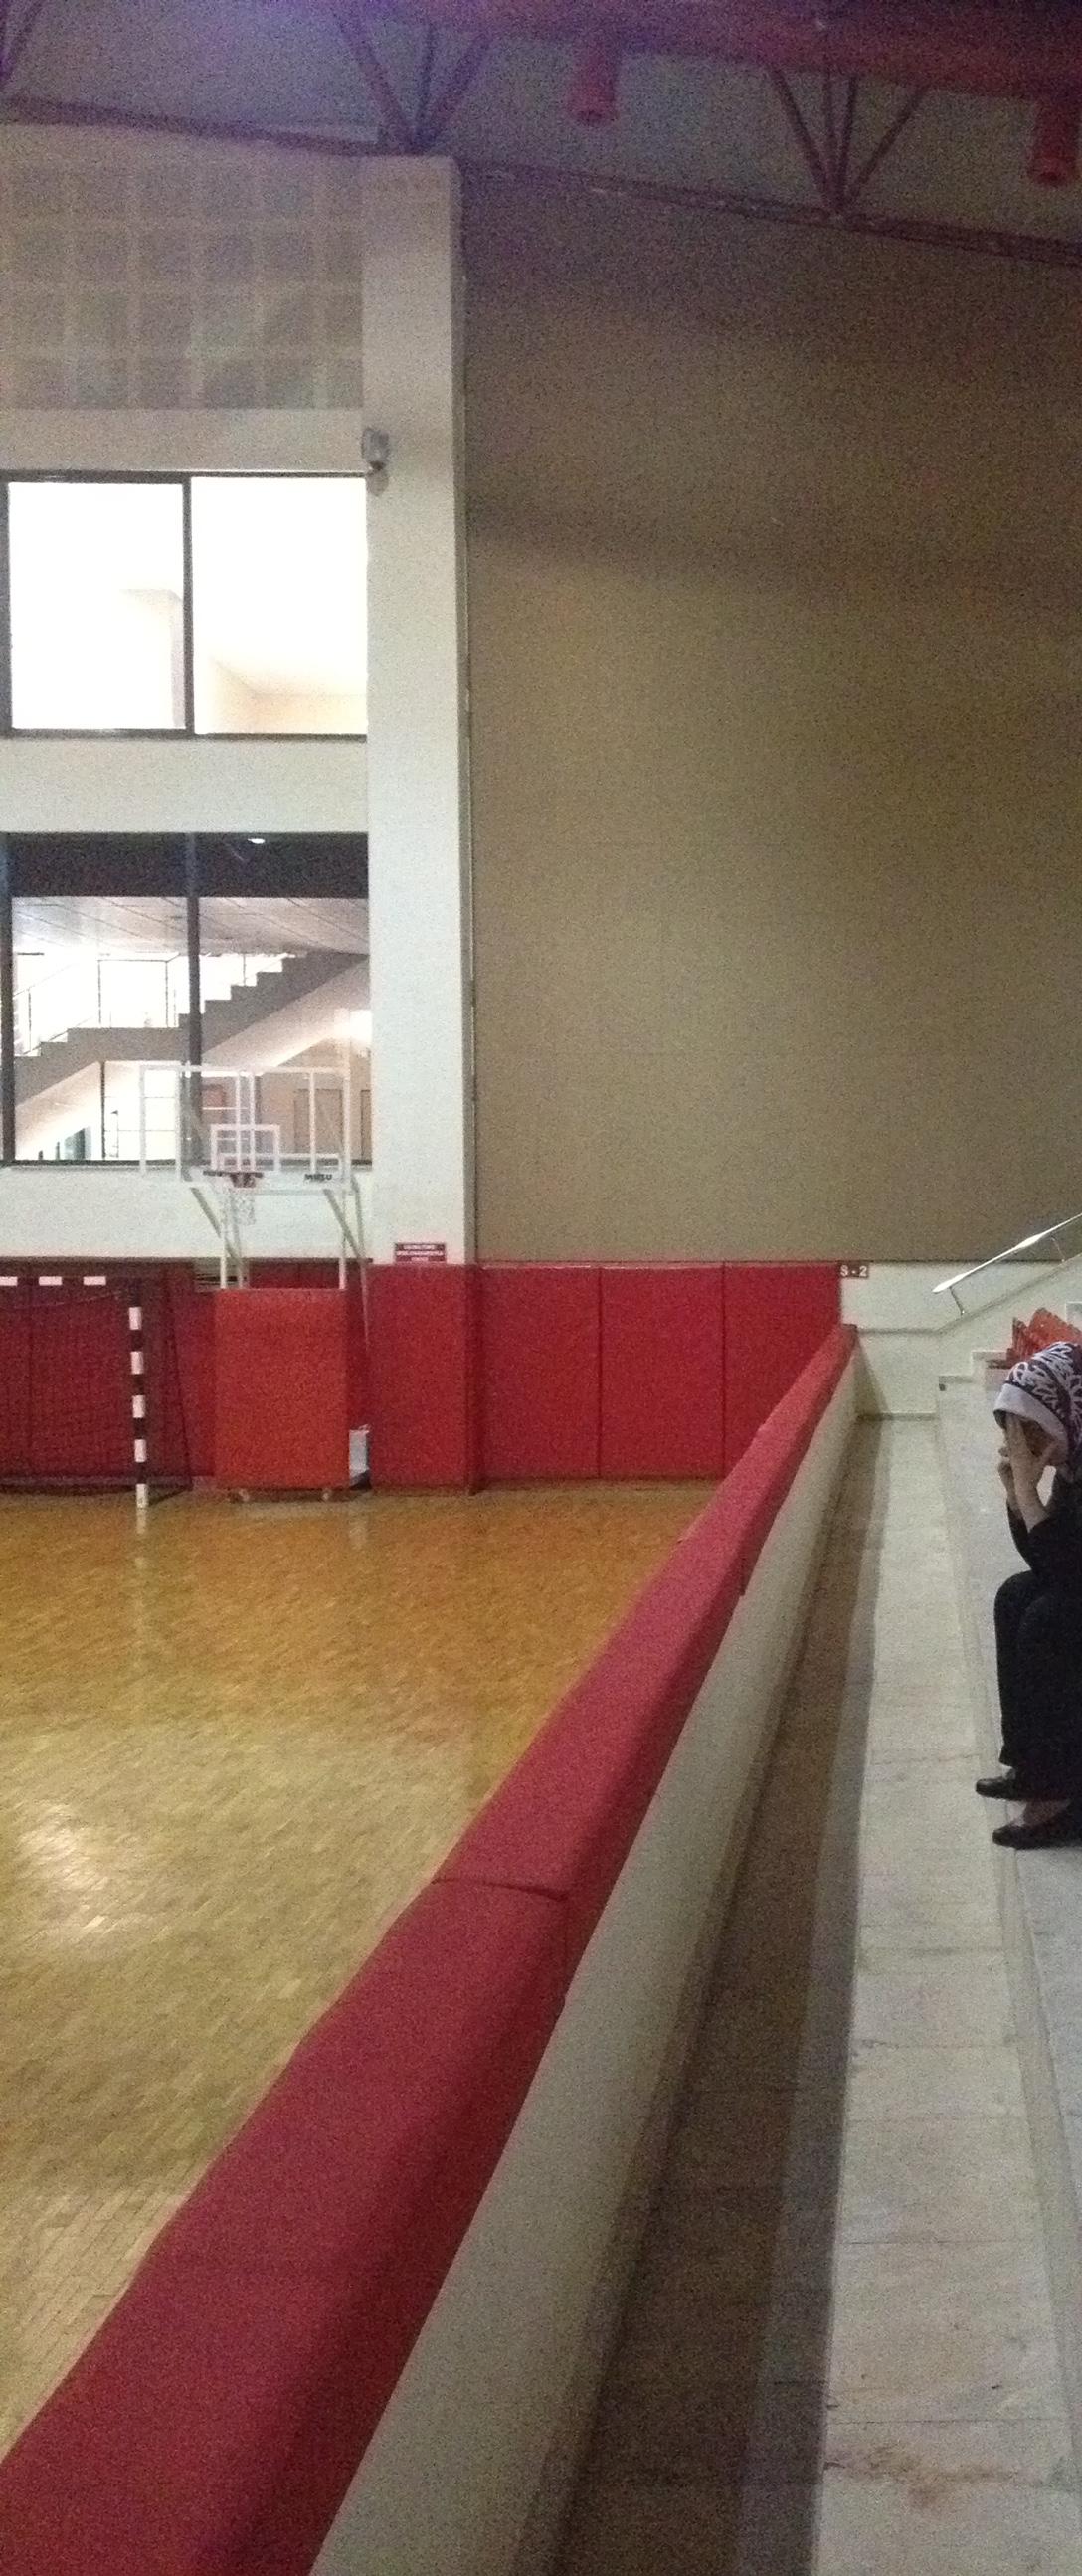 sdü spor salonu (9)